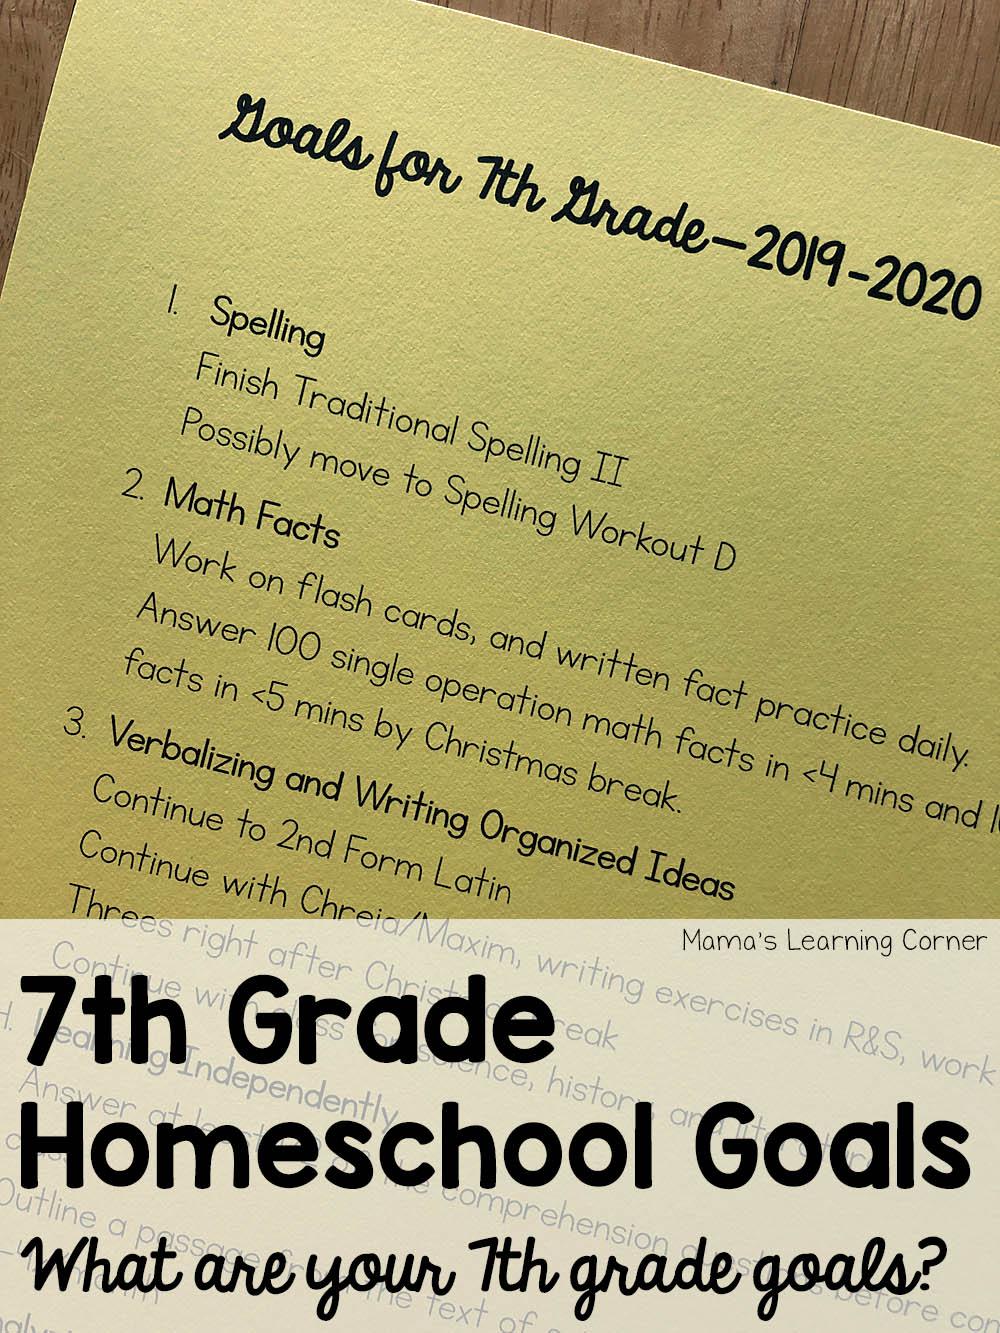 7th Grade Homeschool Goals 2019 2020 Mamas Learning Corner